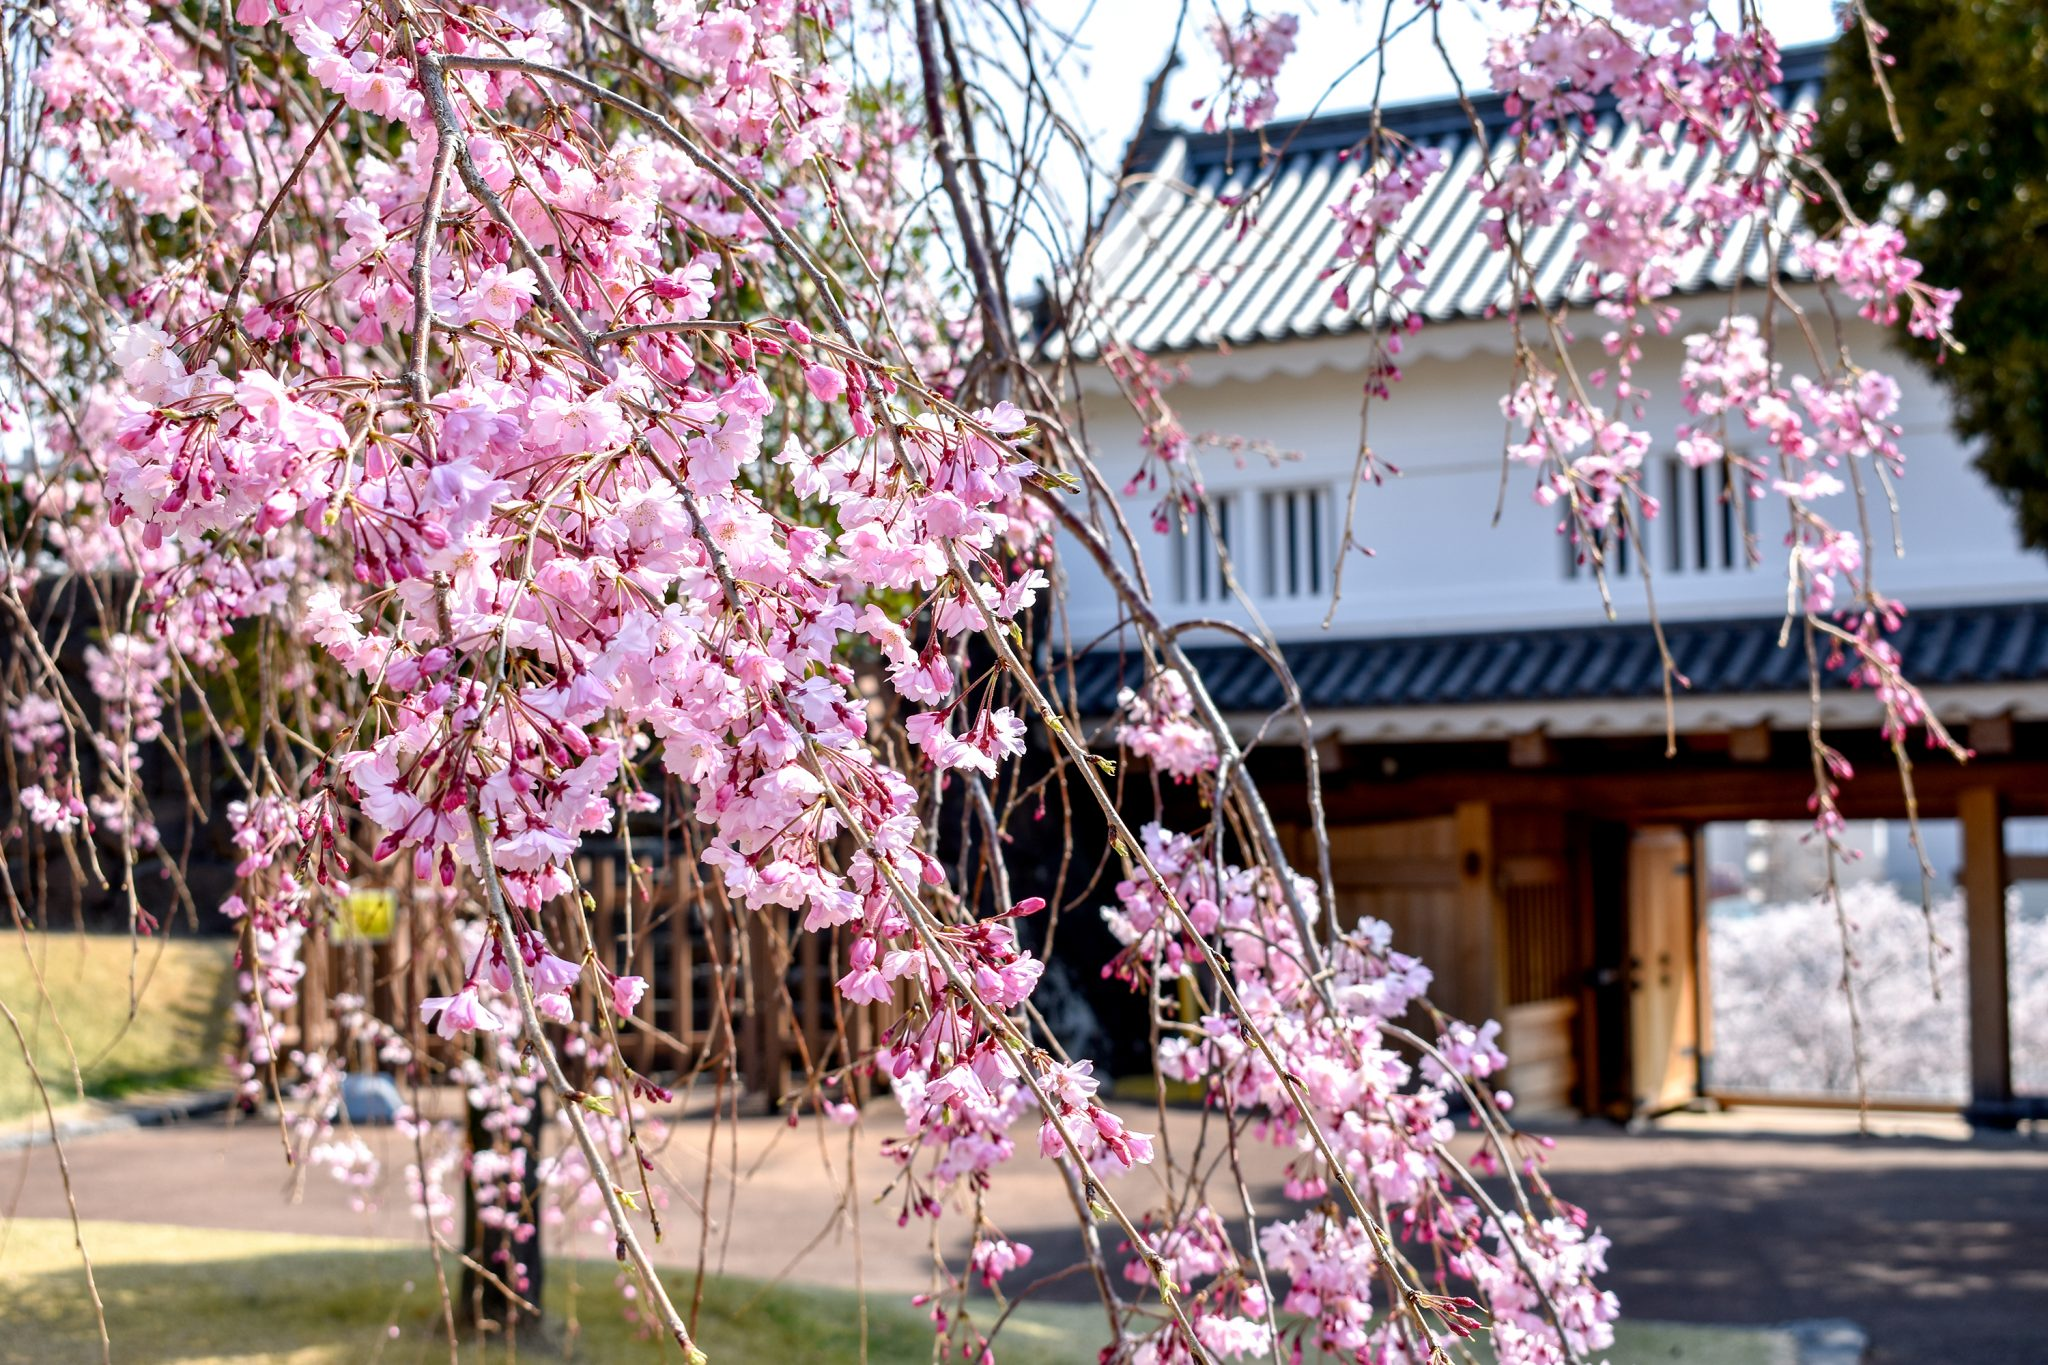 舞鶴城公園の桜 写真8